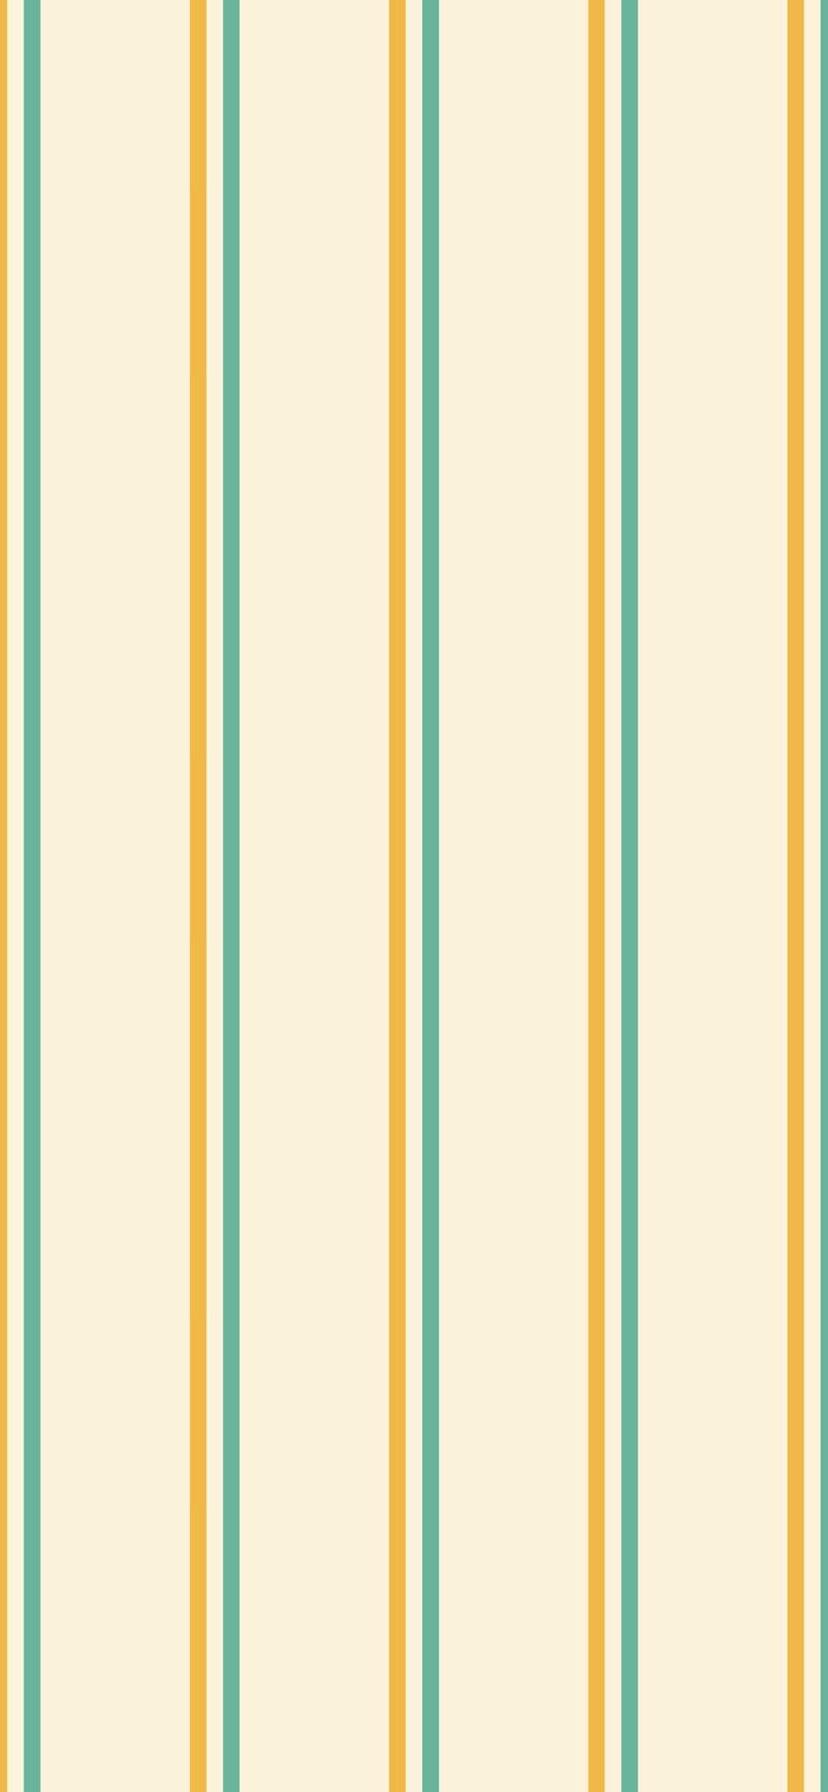 iPhone XR 壁紙 wallpaper 0392